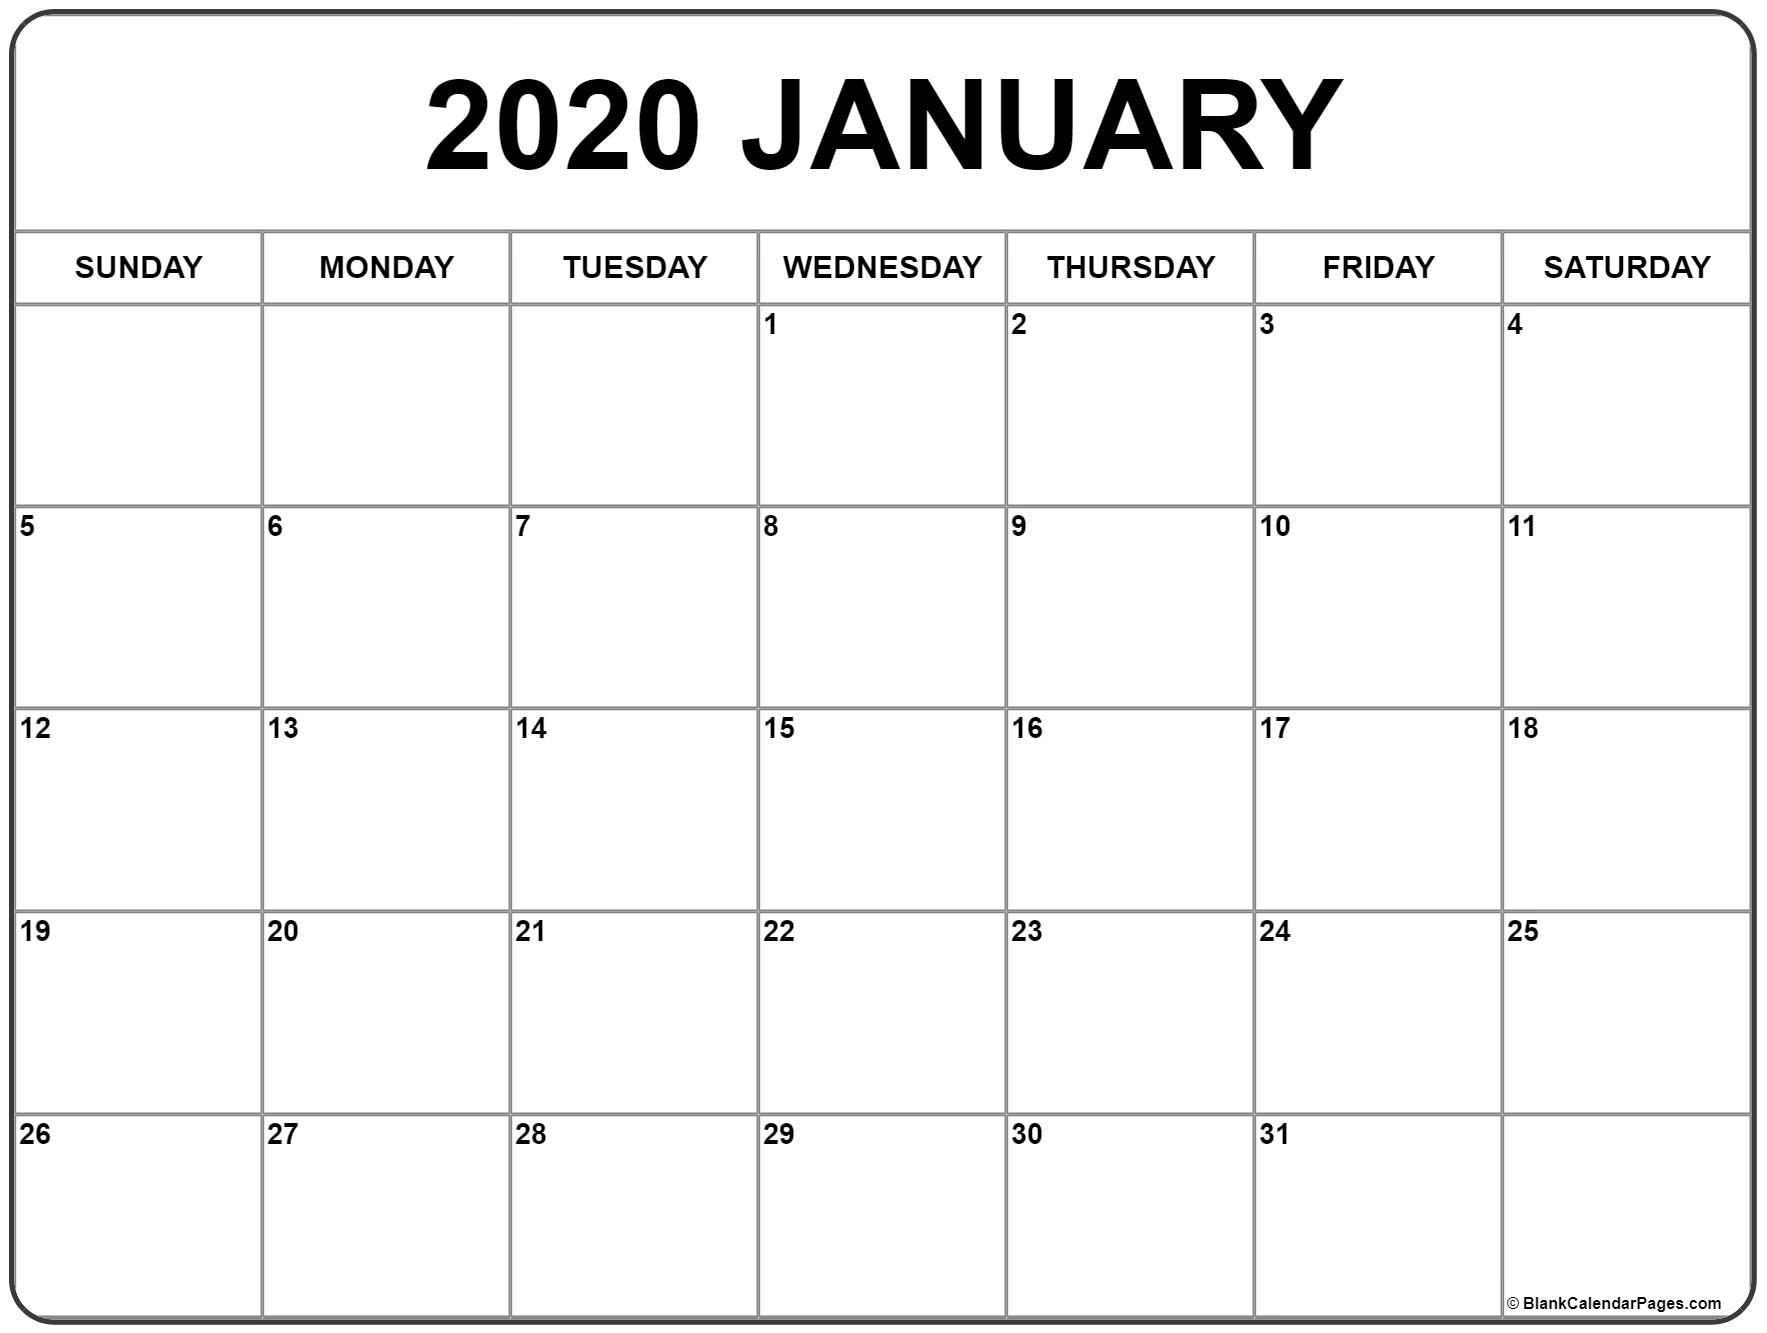 January 2020 Calendar | Free Printable Monthly Calendars  Where I Print A Full Page Monthly Calendar For 2020